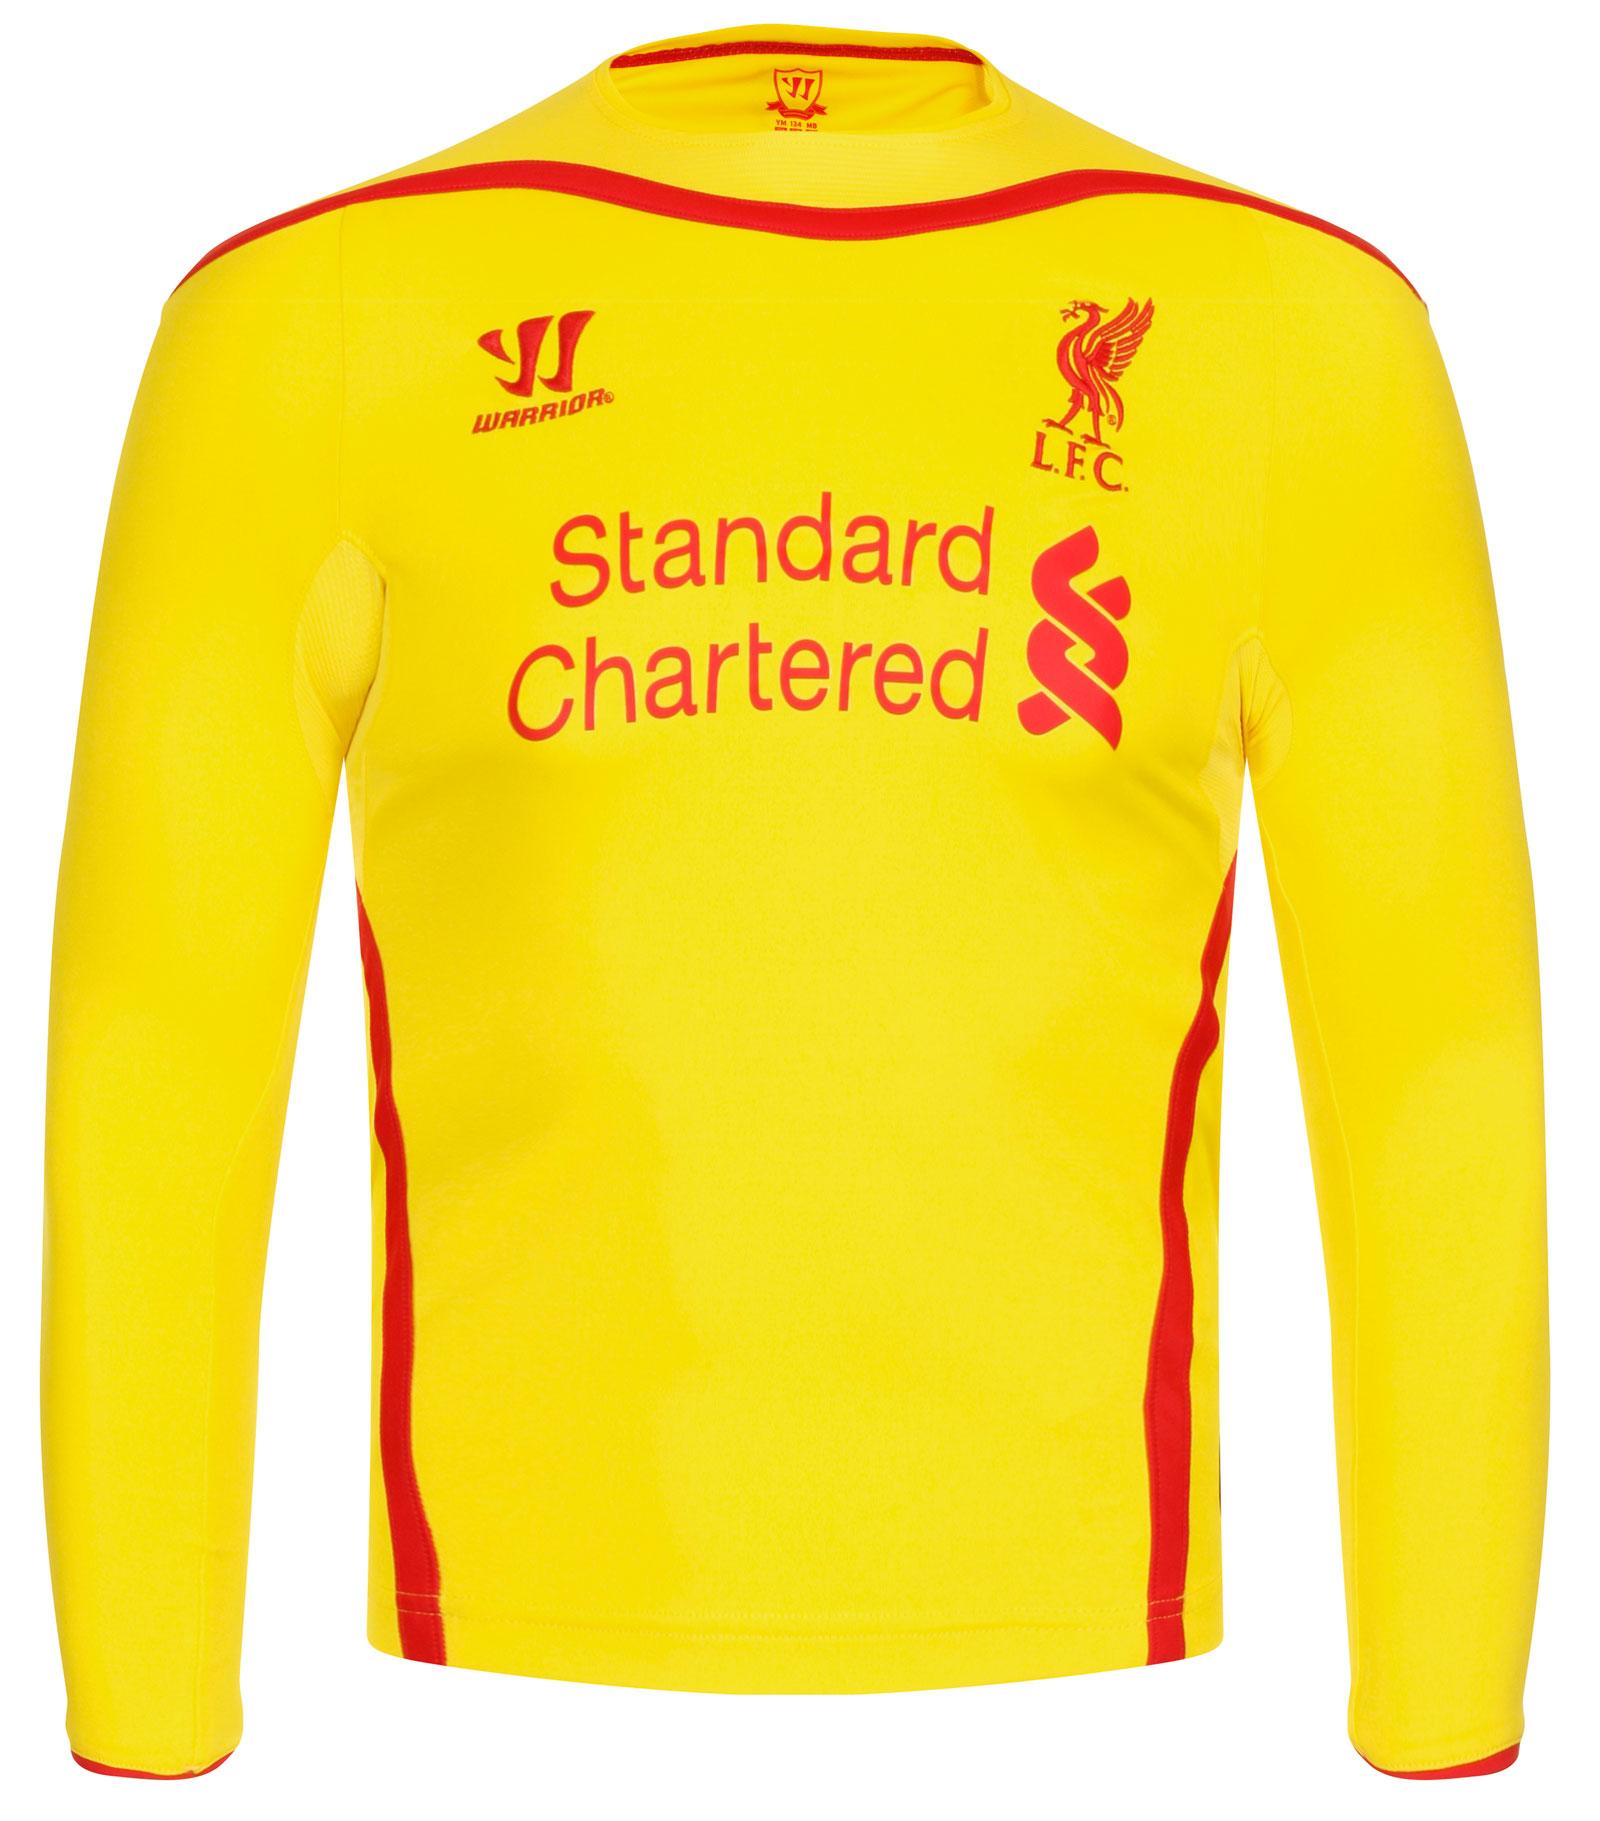 the best attitude 67cde feedd Details about Warrior Liverpool LFC 2014/15 Away Junior Long Sleeve Shirt  Size XL